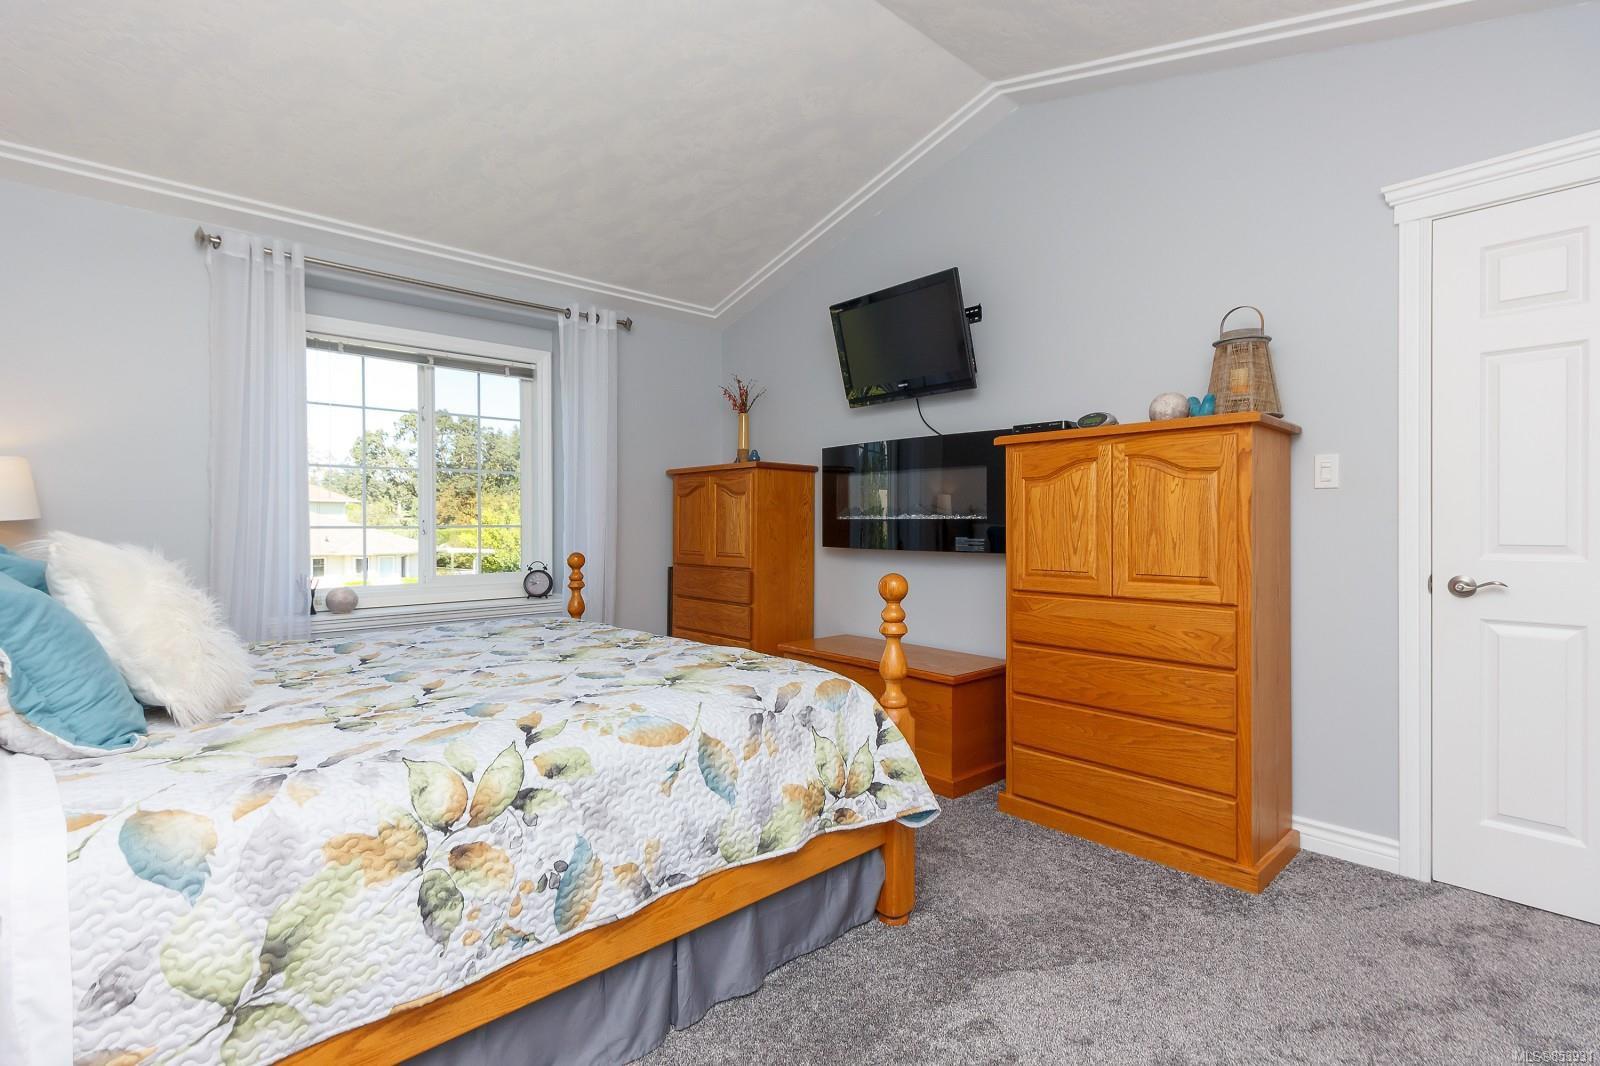 Photo 11: Photos: 2456 Timbercrest Dr in : Du East Duncan House for sale (Duncan)  : MLS®# 853931